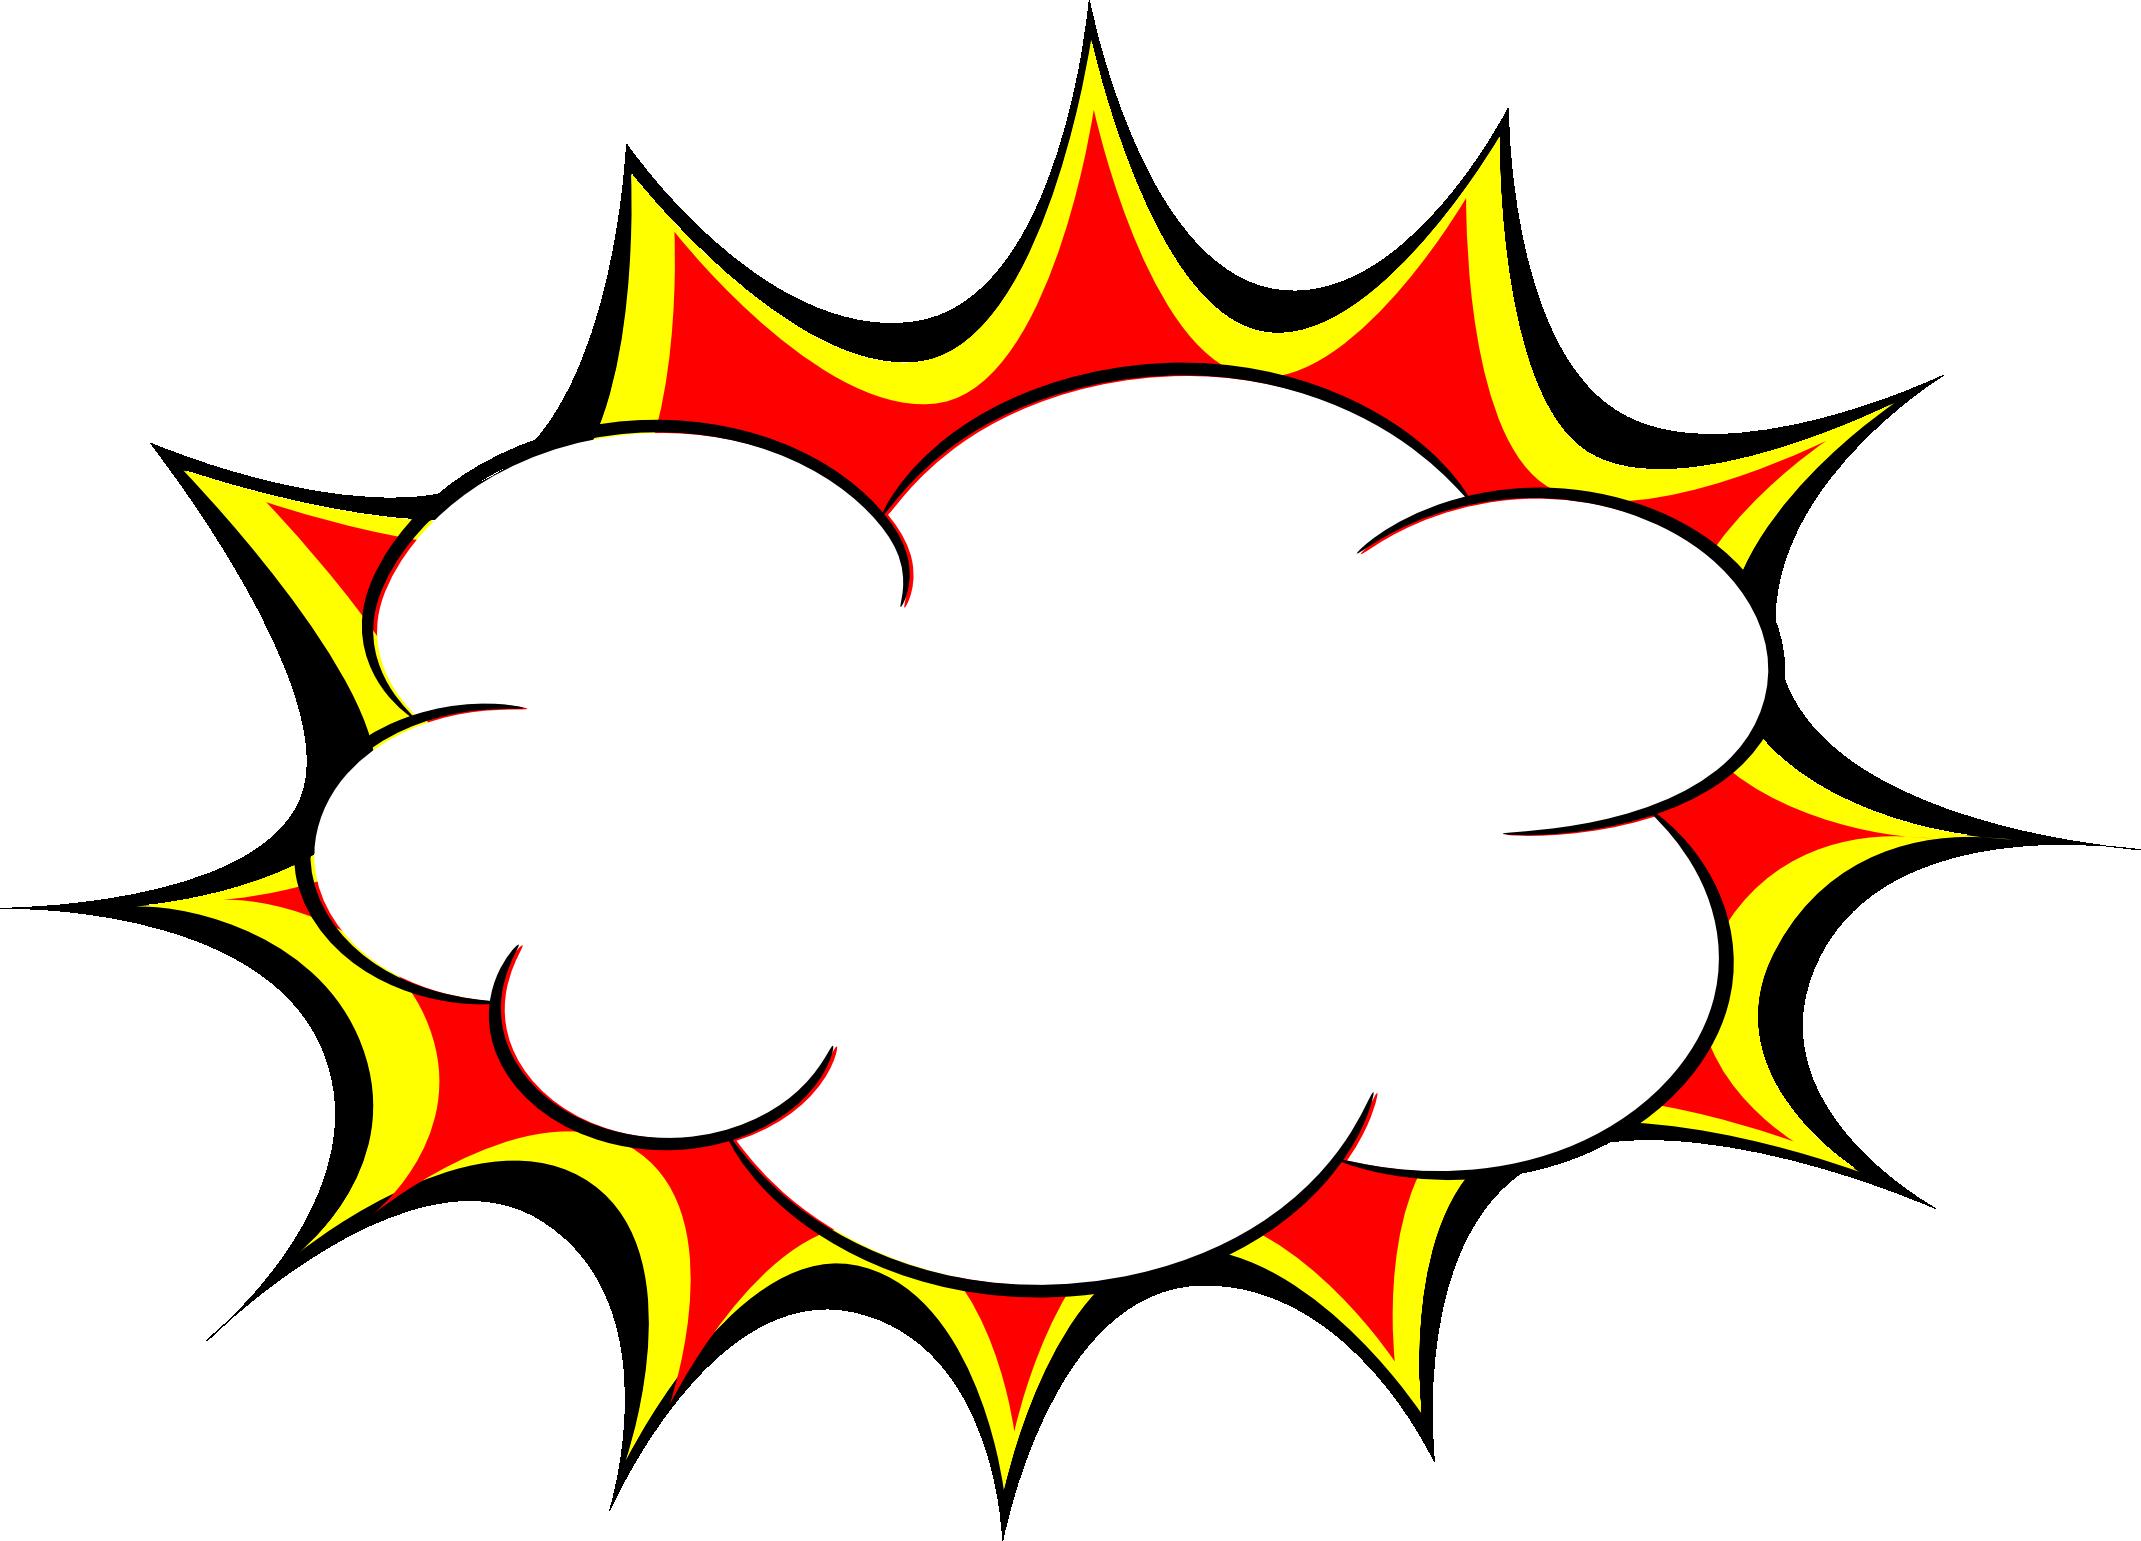 Superheroes clipart burst, Superheroes burst Transparent ...